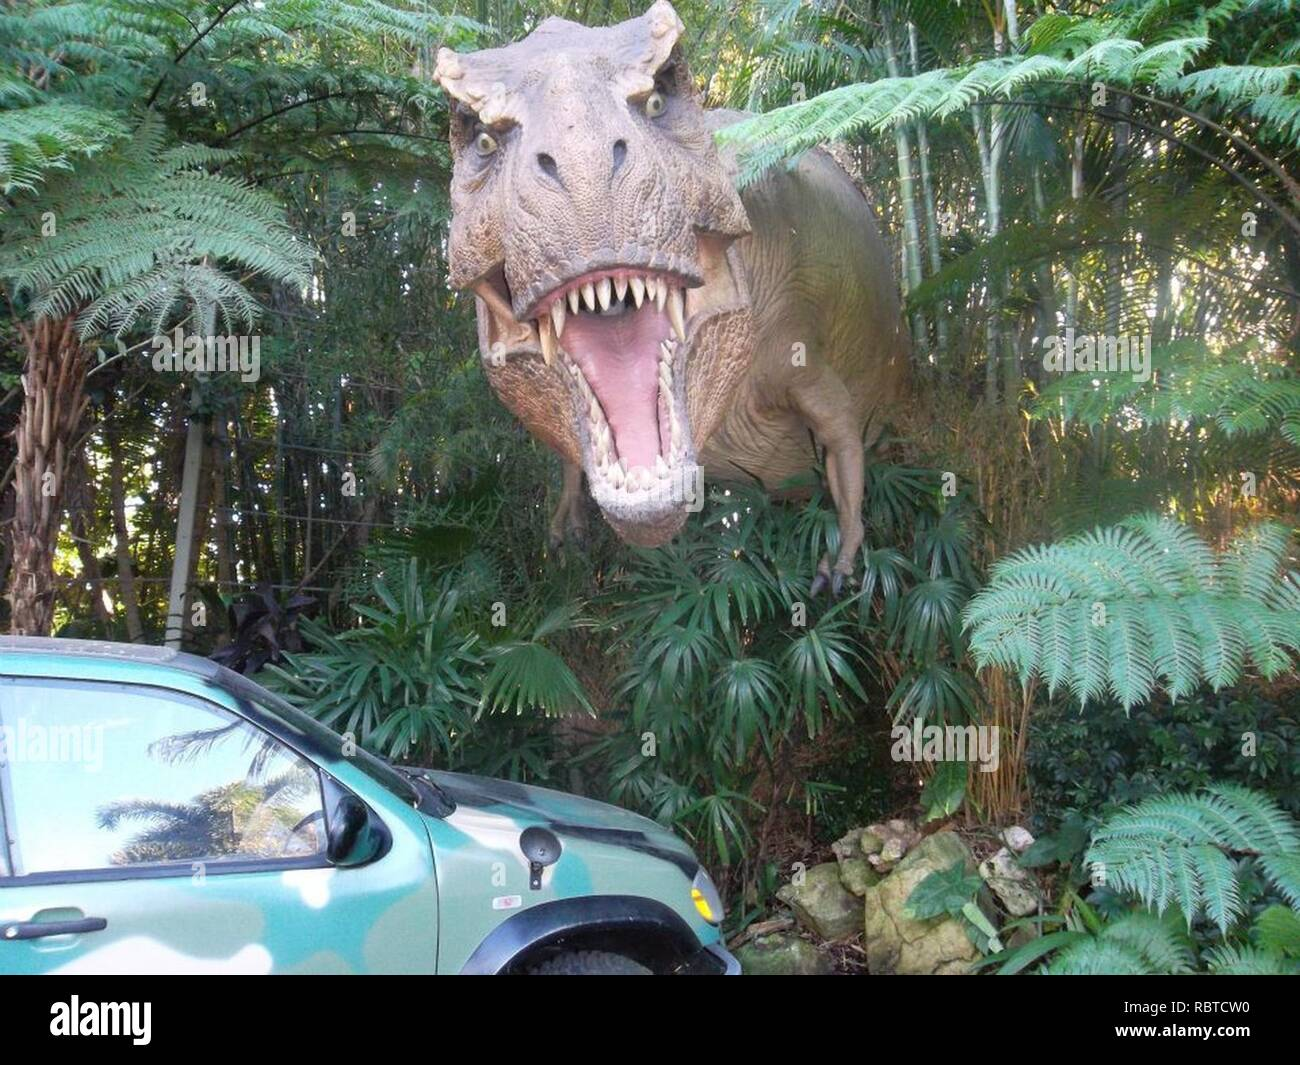 Un T Rex Y Coches De Jurassic Park Universal Orlando Fotografia De Stock Alamy Things to do near universal studios singapore. https www alamy es un t rex y coches de jurassic park universal orlando image231032956 html